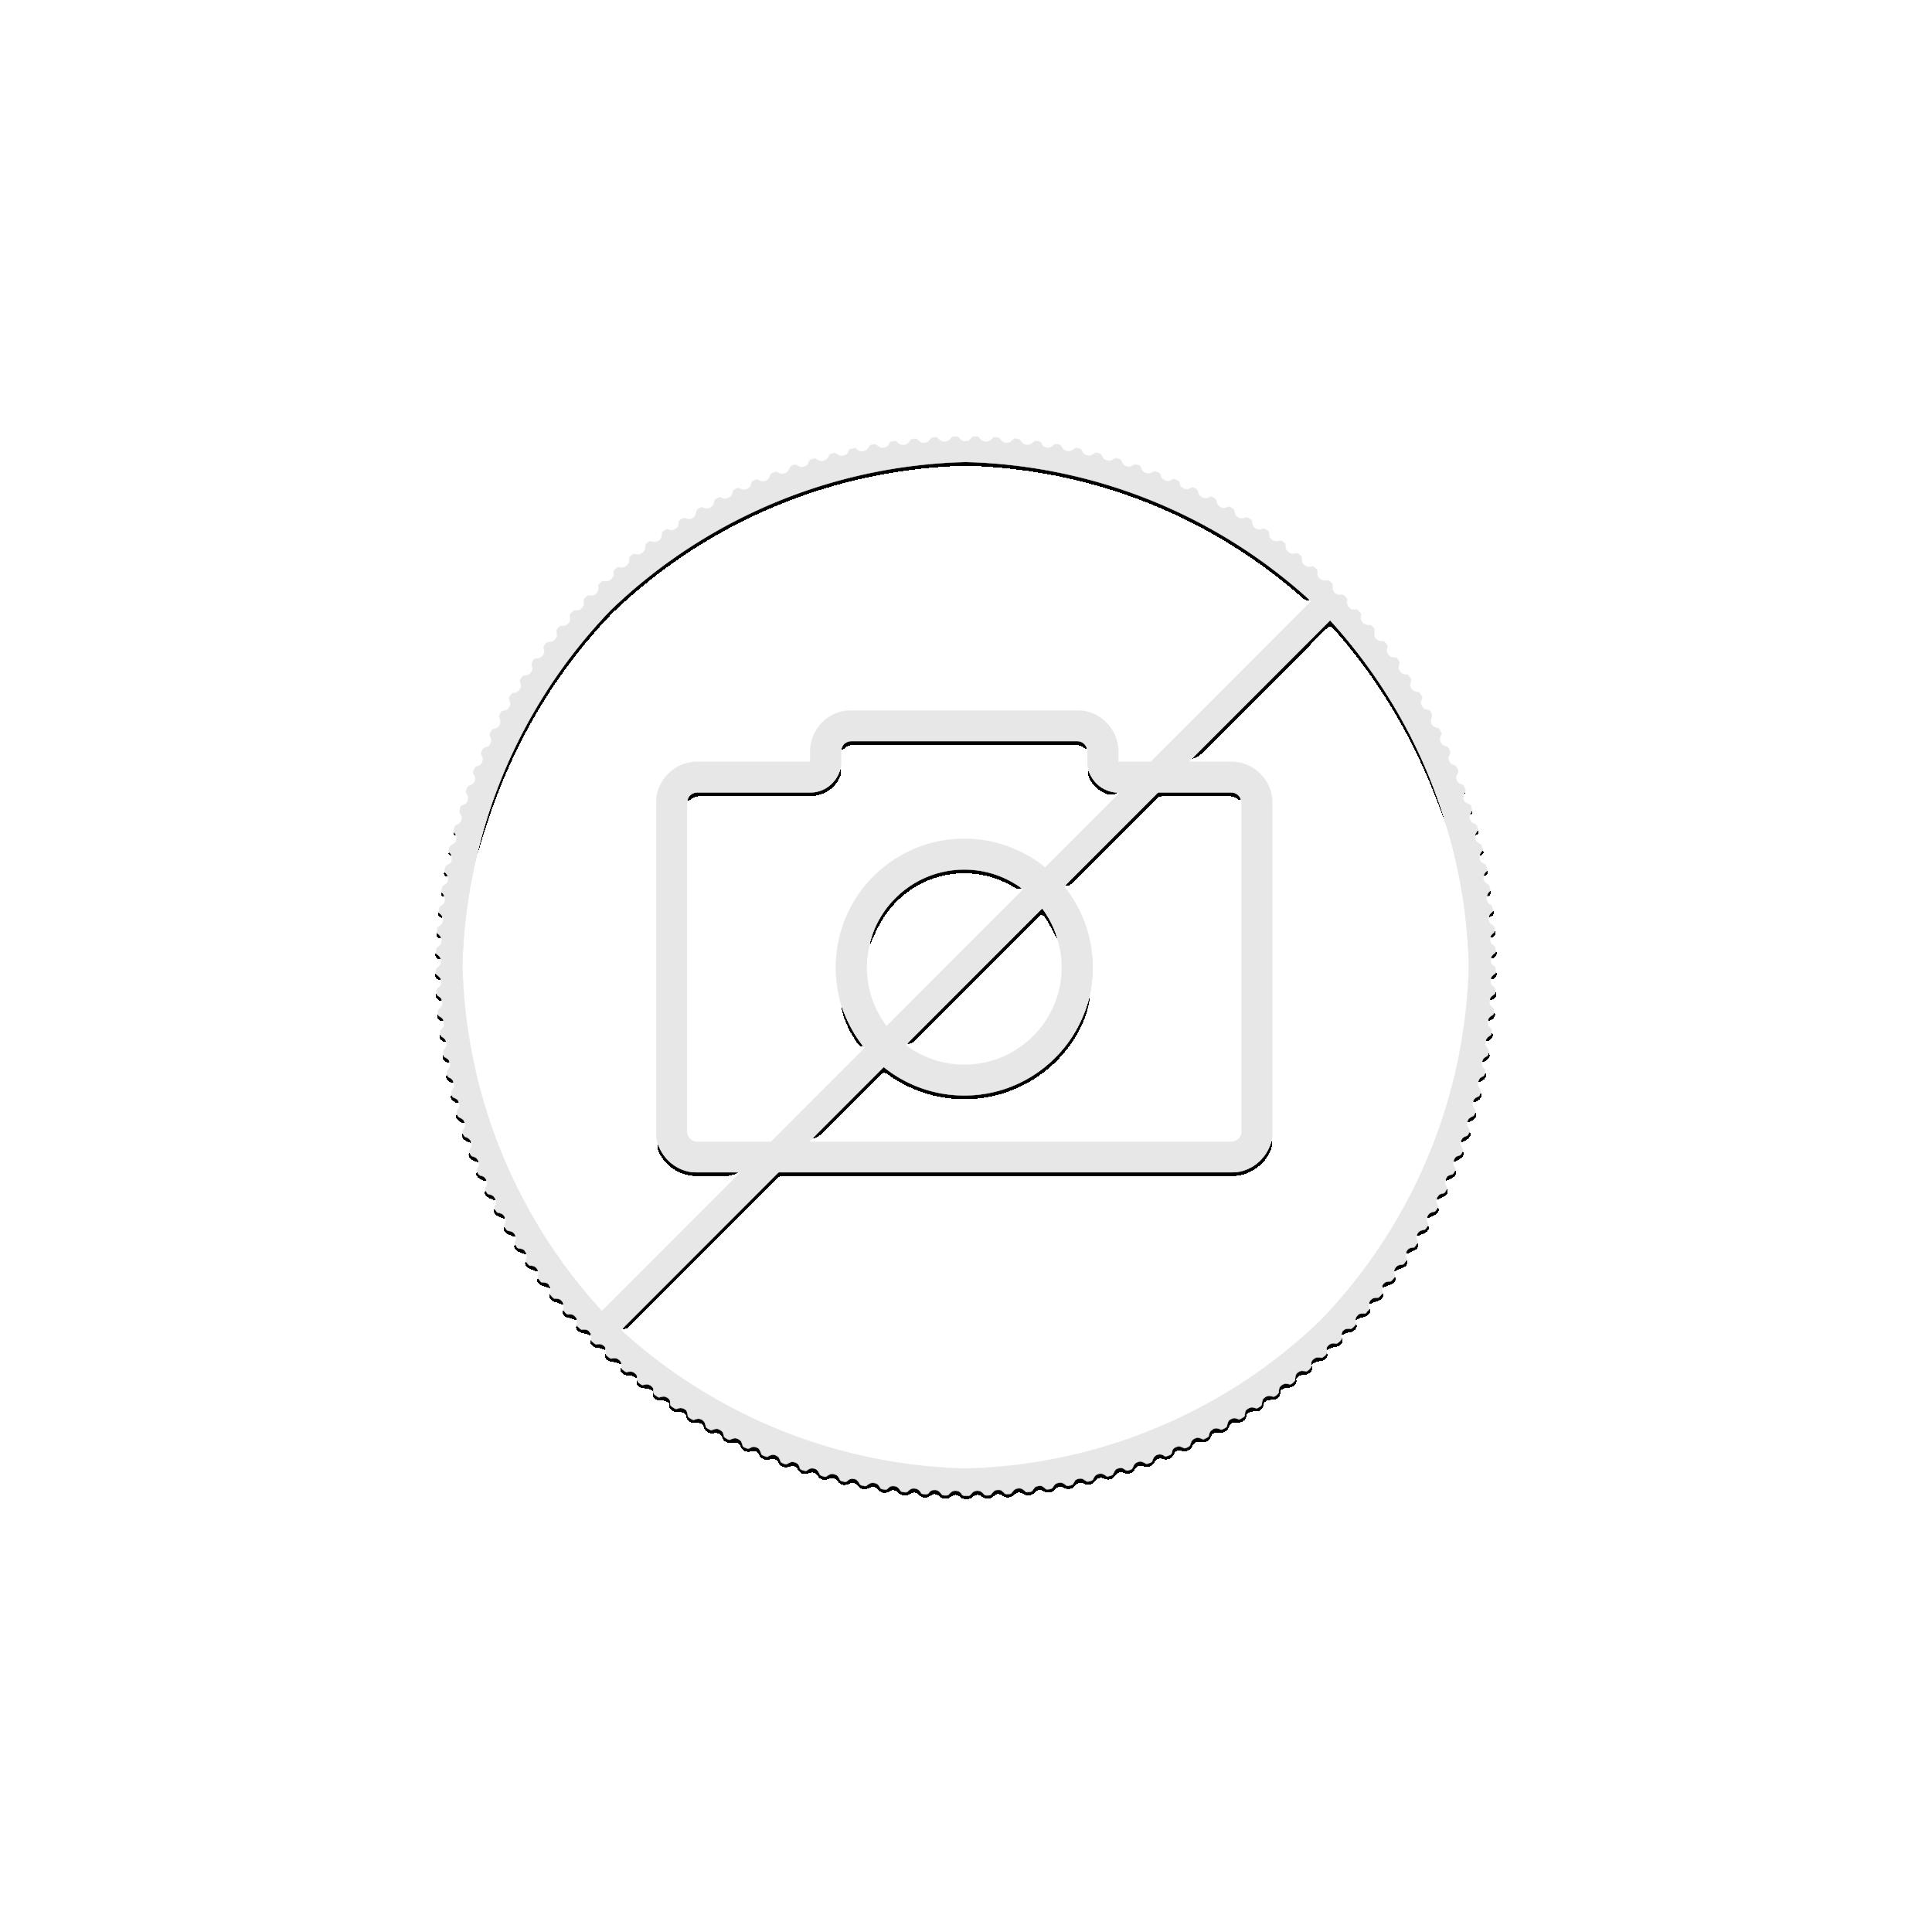 5 troy ounce gouden munt Kookaburra 2021 Proof